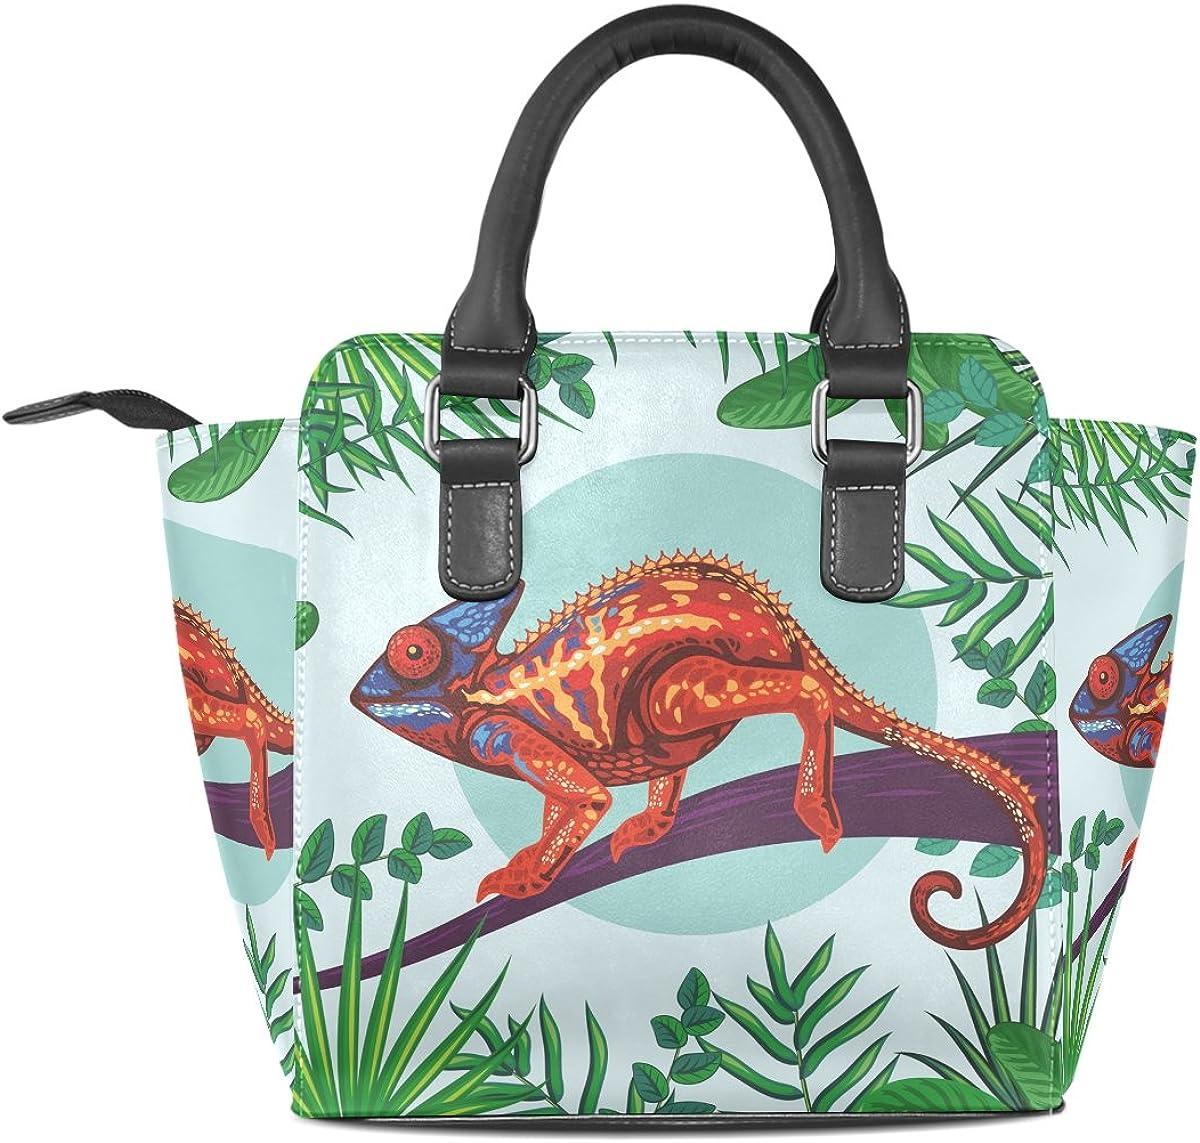 Jennifer Chameleon With Green Leaves PU Leather Top-Handle Handbags Single-Shoulder Tote Crossbody Bag Messenger Bags For Women